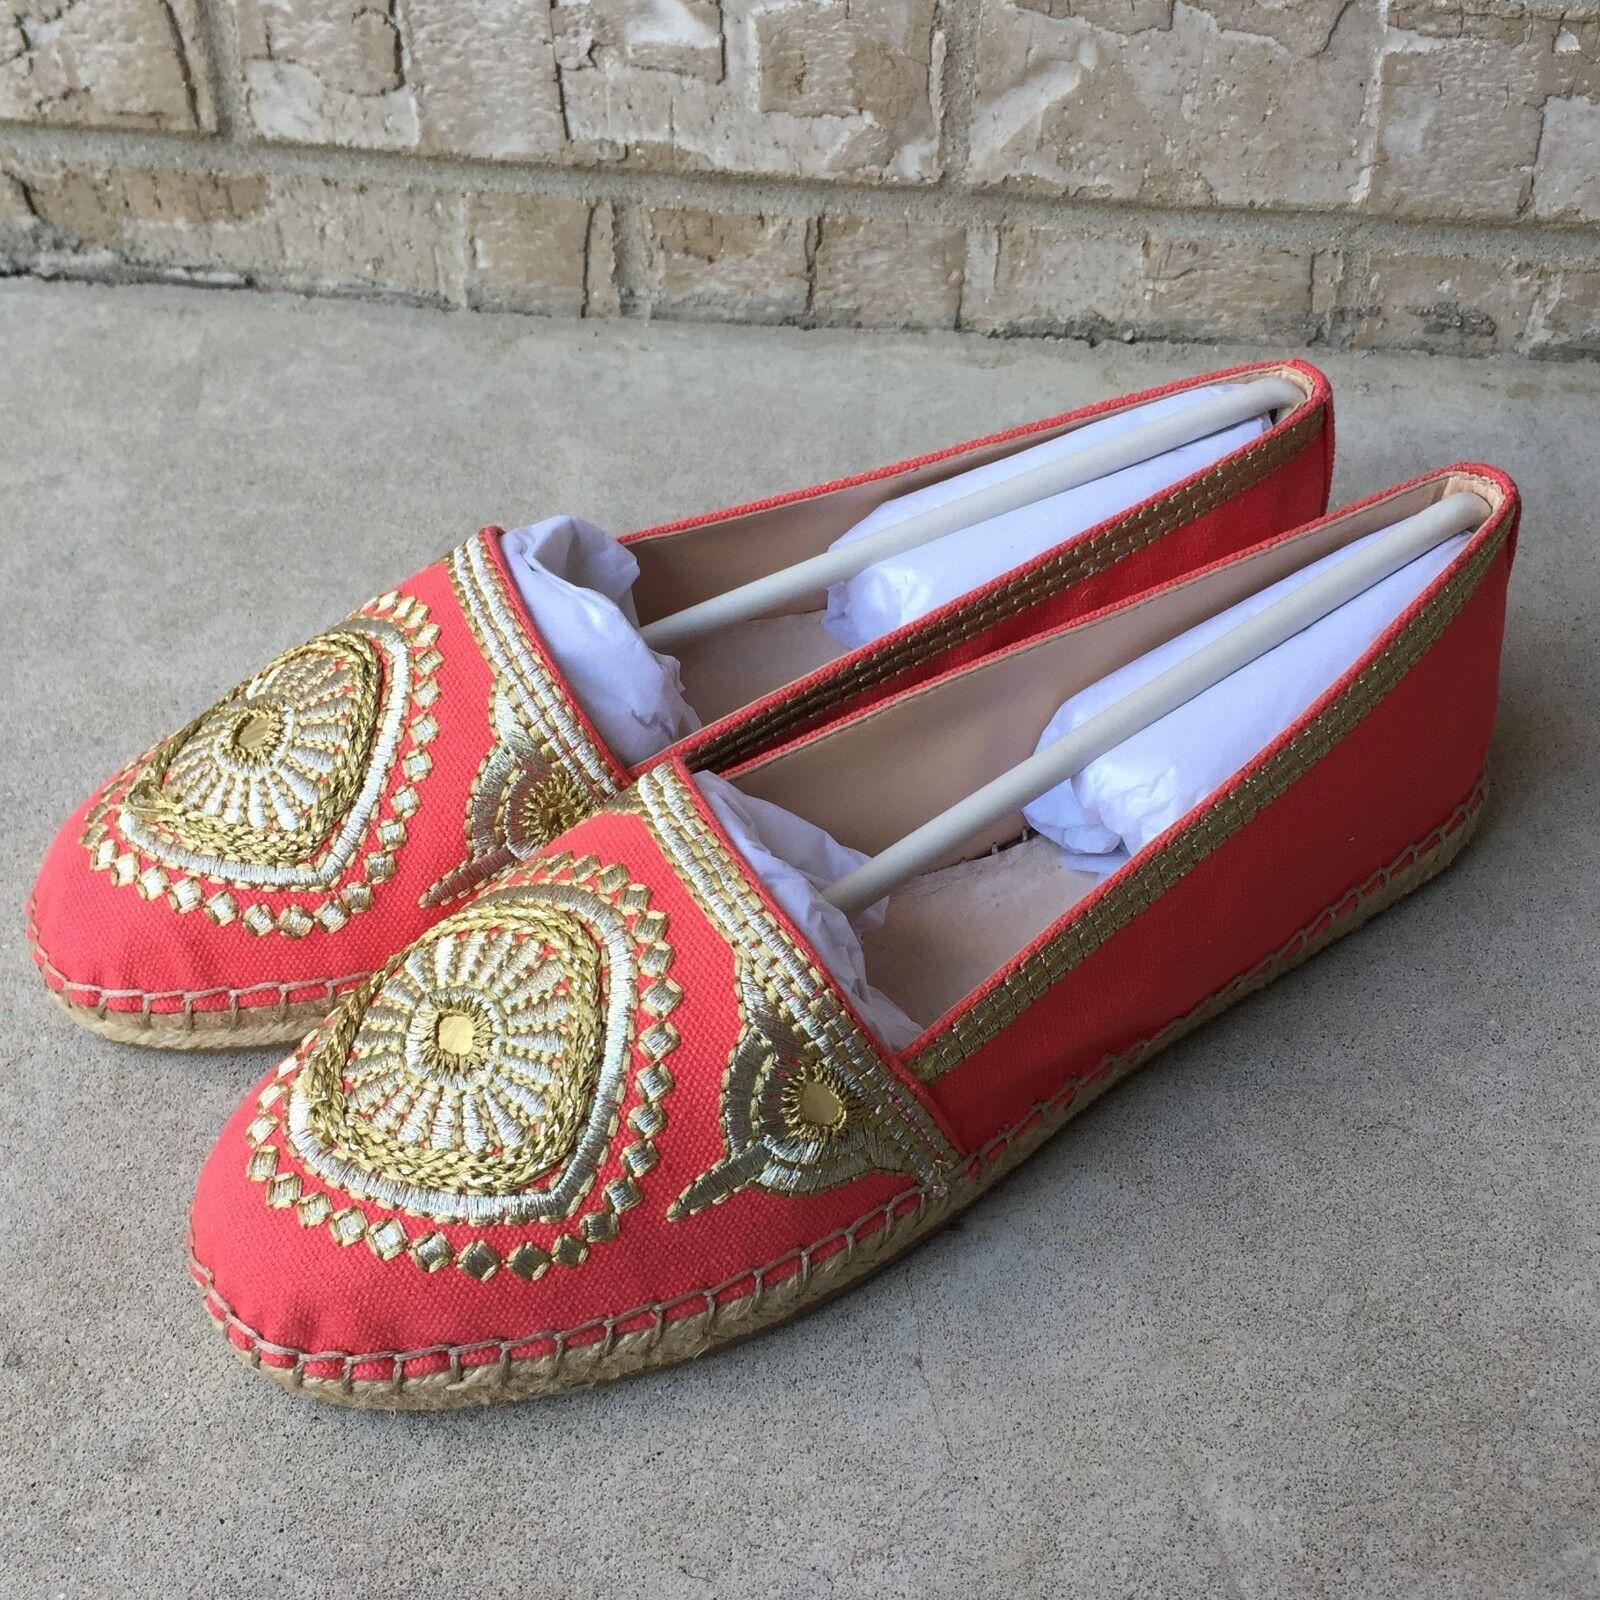 NWB Vince Camuto Dayna Flat Coral EmbroideROT Espadrilles Schuhes Damenschuhe Größe 10 M